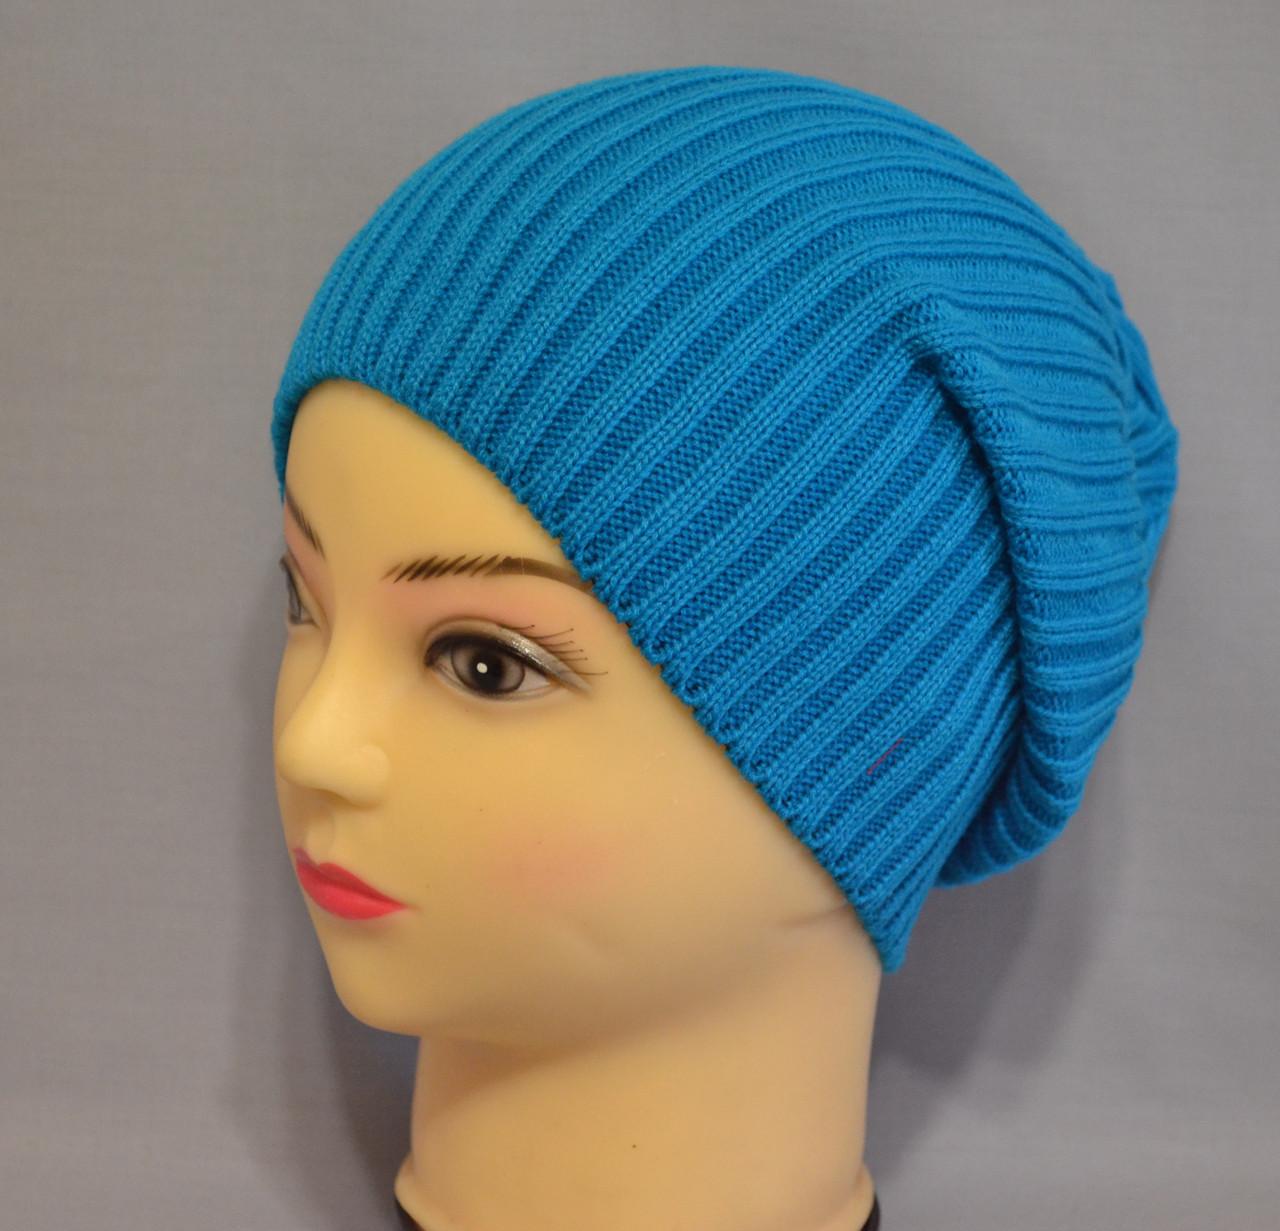 Вязание шапки спицами для молодежи 7